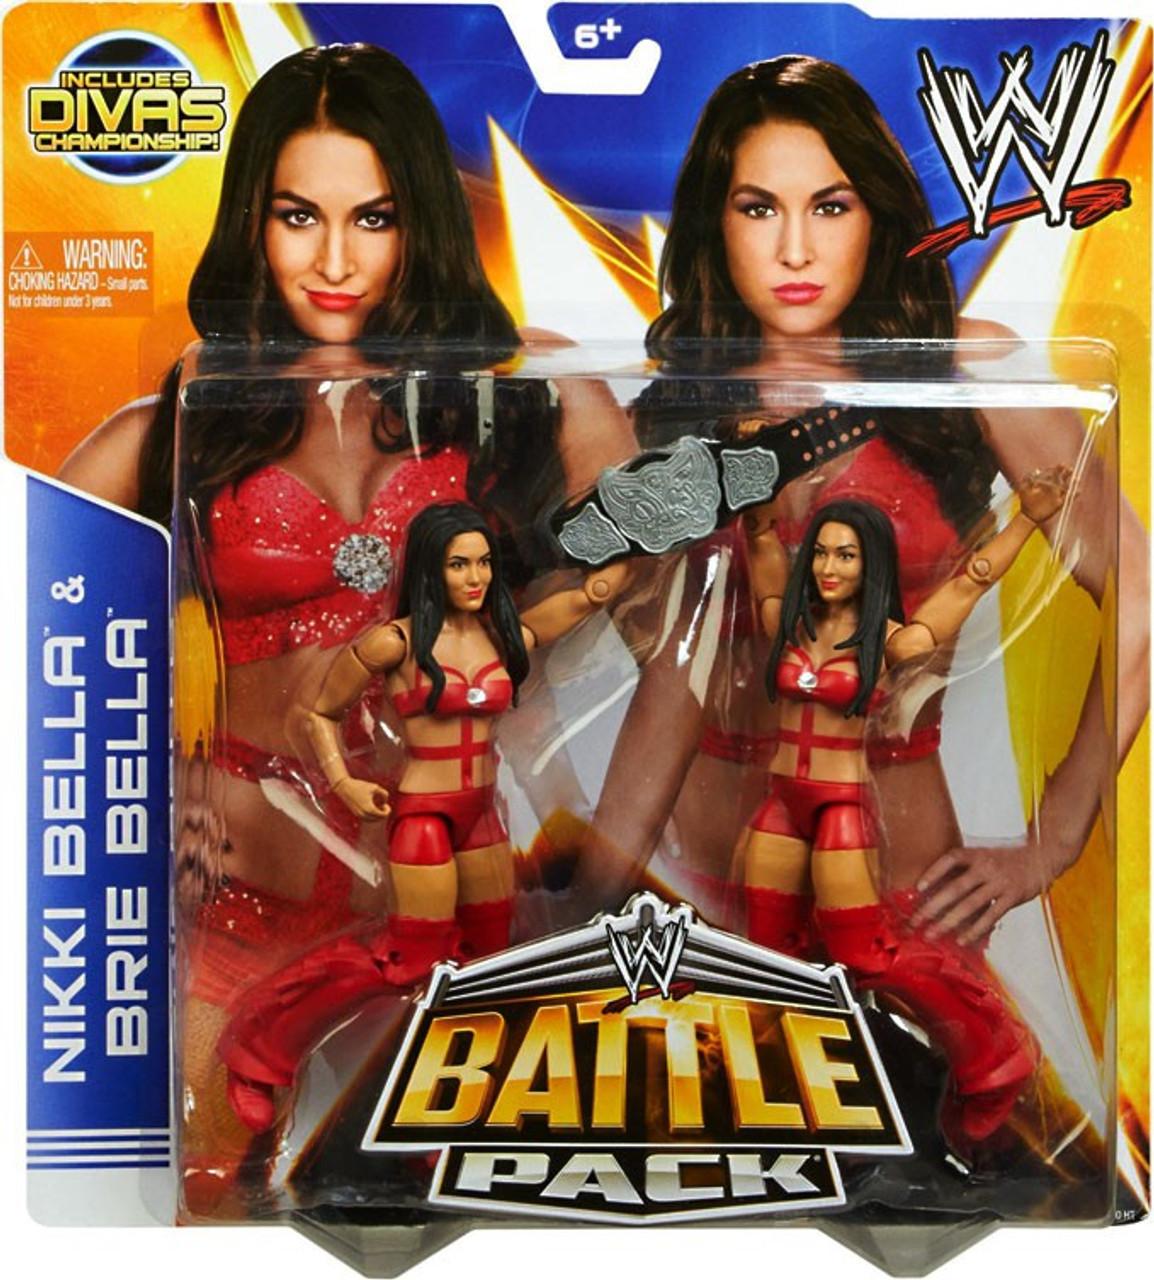 WWE Wrestling Series 26 Nikki Bella & Brie Bella Action Figure 2-Pack [Red Outfits, Divas Championship]